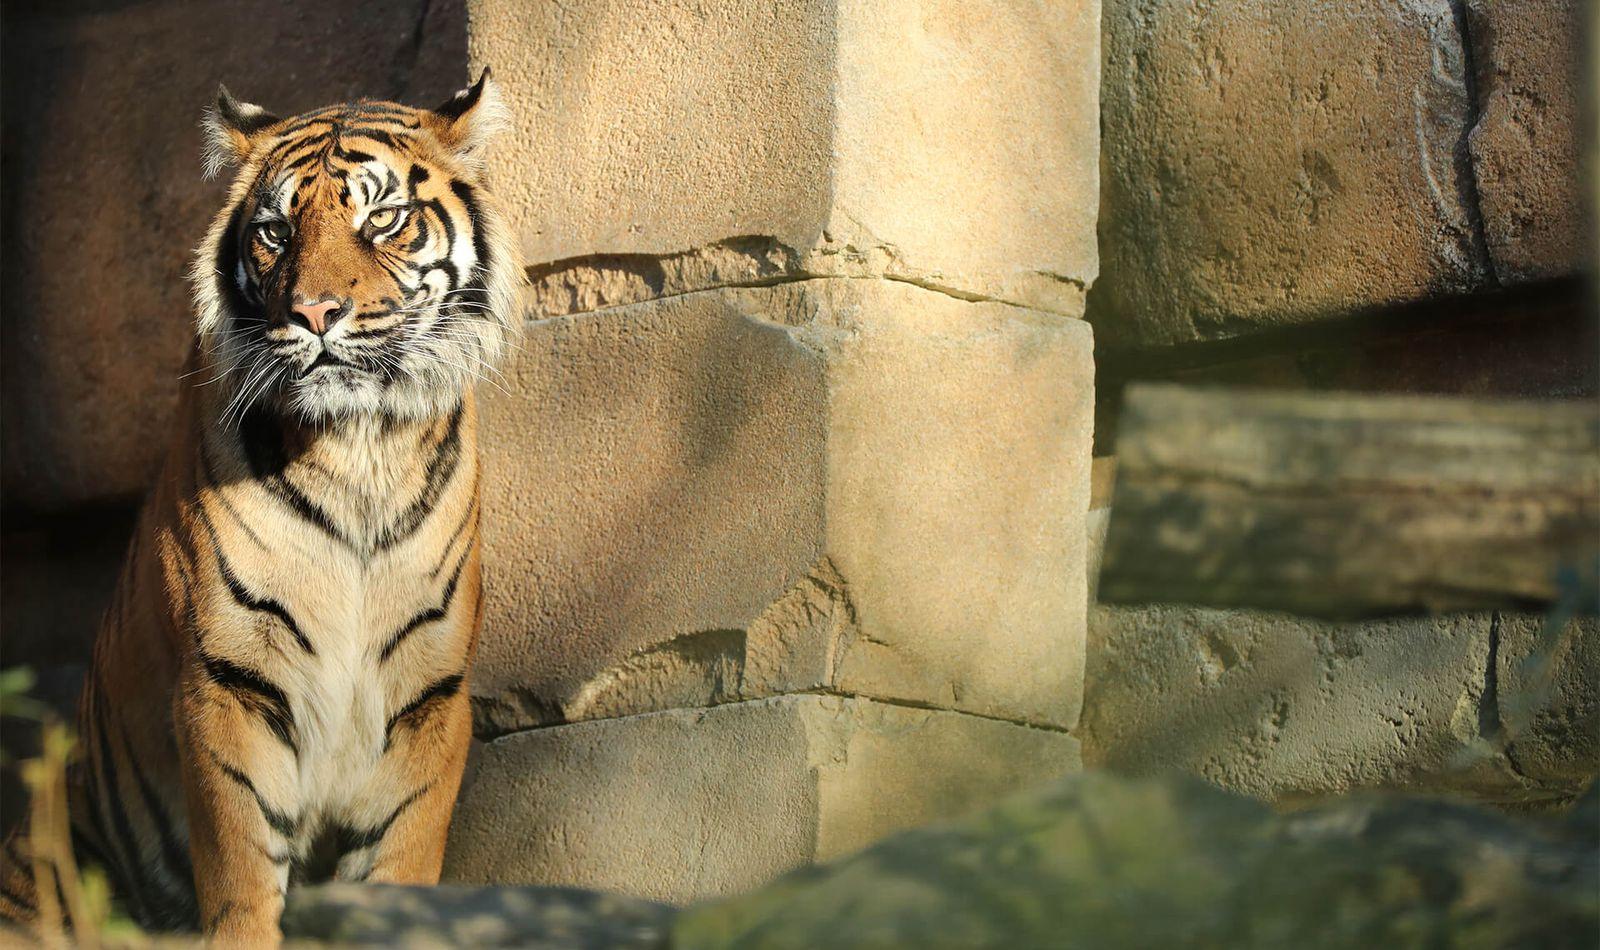 Tigre de Sumatra - Animaux extraordinaires du ZooParc